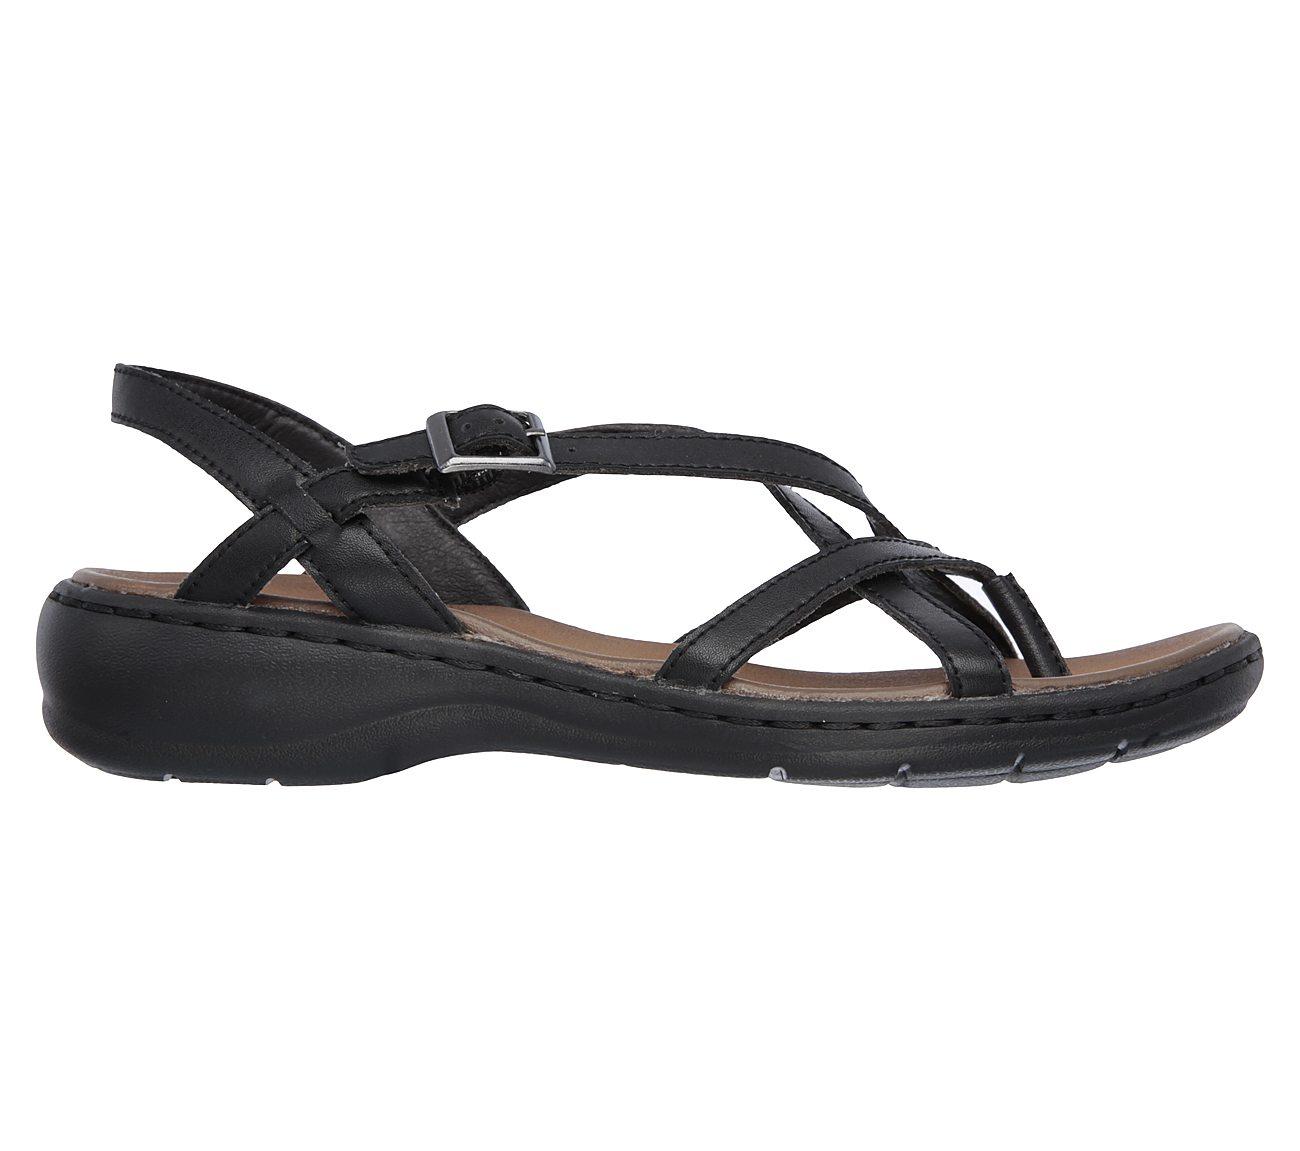 01c851b5da0 Buy SKECHERS Passenger - Bon Voyage USA Casuals Shoes only $55.00